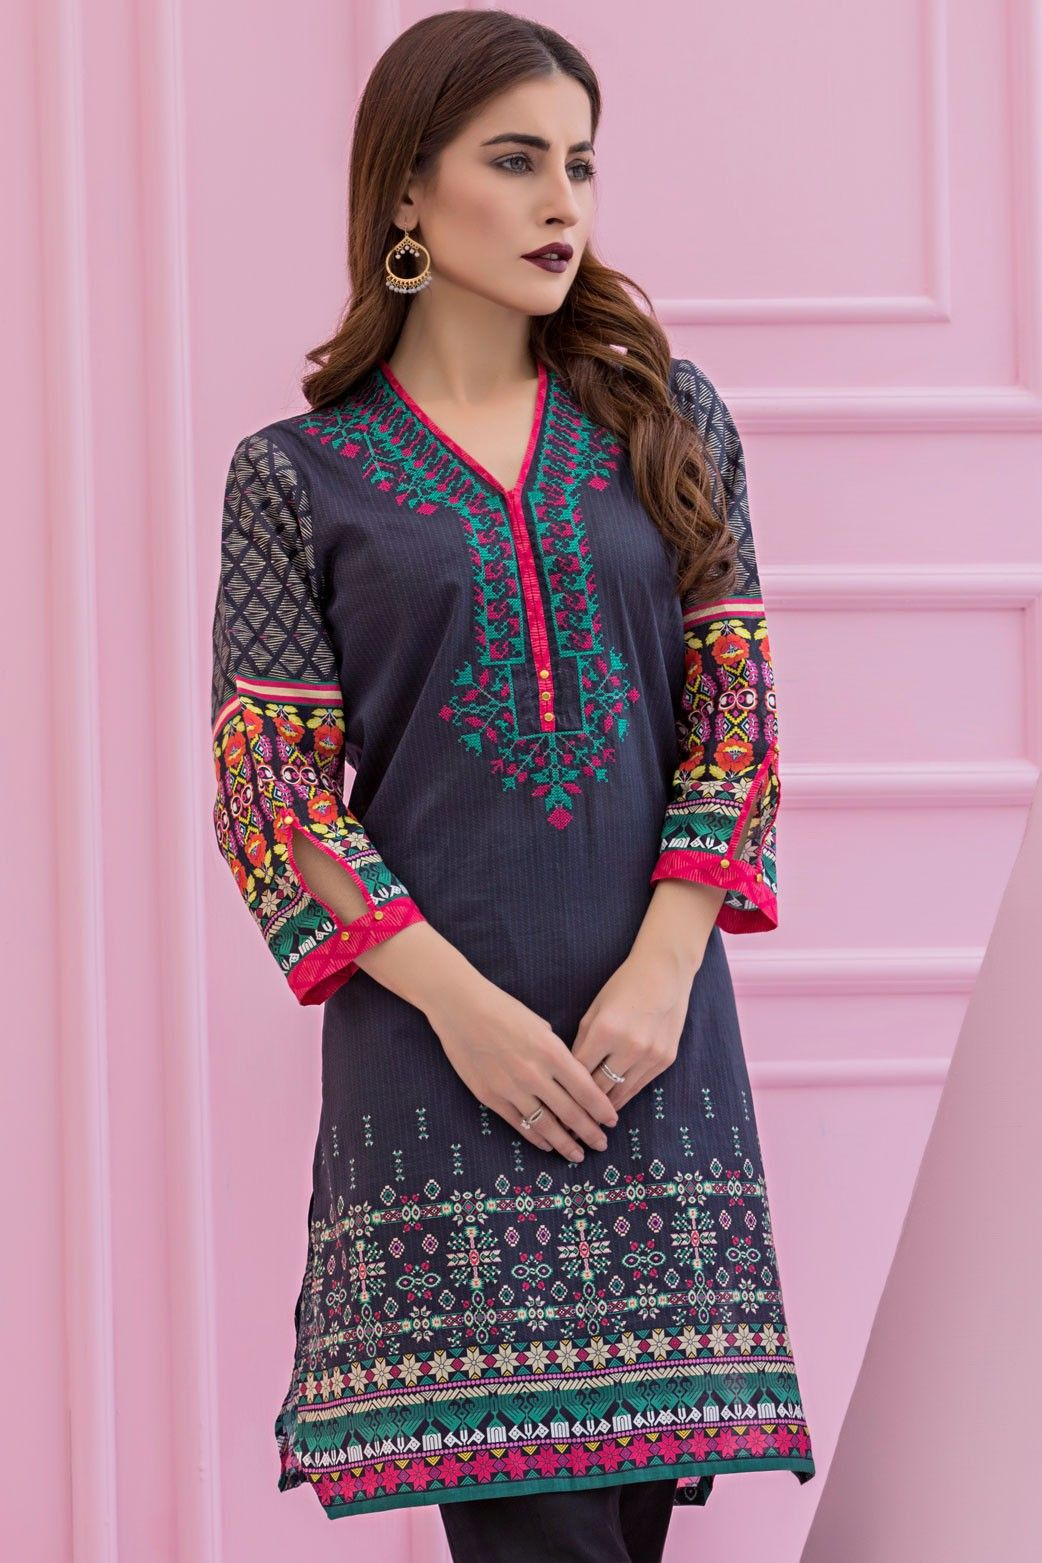 Ethnic Galore By Zeen Cambridge Pre Fall Cambric Collection2017 Is A Ready To Pakistani Wear Kurti Available For Shopping Online. #wintercollection  #blackfriday #readytowear #pretwear  #unstitched #online  #linen #linencollection  #lahore #karachi #islamabad #newyork #london  #pakistan #pakistani #indian #alkaram #breakout #zeen  #khaadi #sanasafinaz #limelight #nishat #khaddar #daraz #gulahmed #2017 #2018  #blackfriday #pakistani_dresses #best_price #indian_dresses